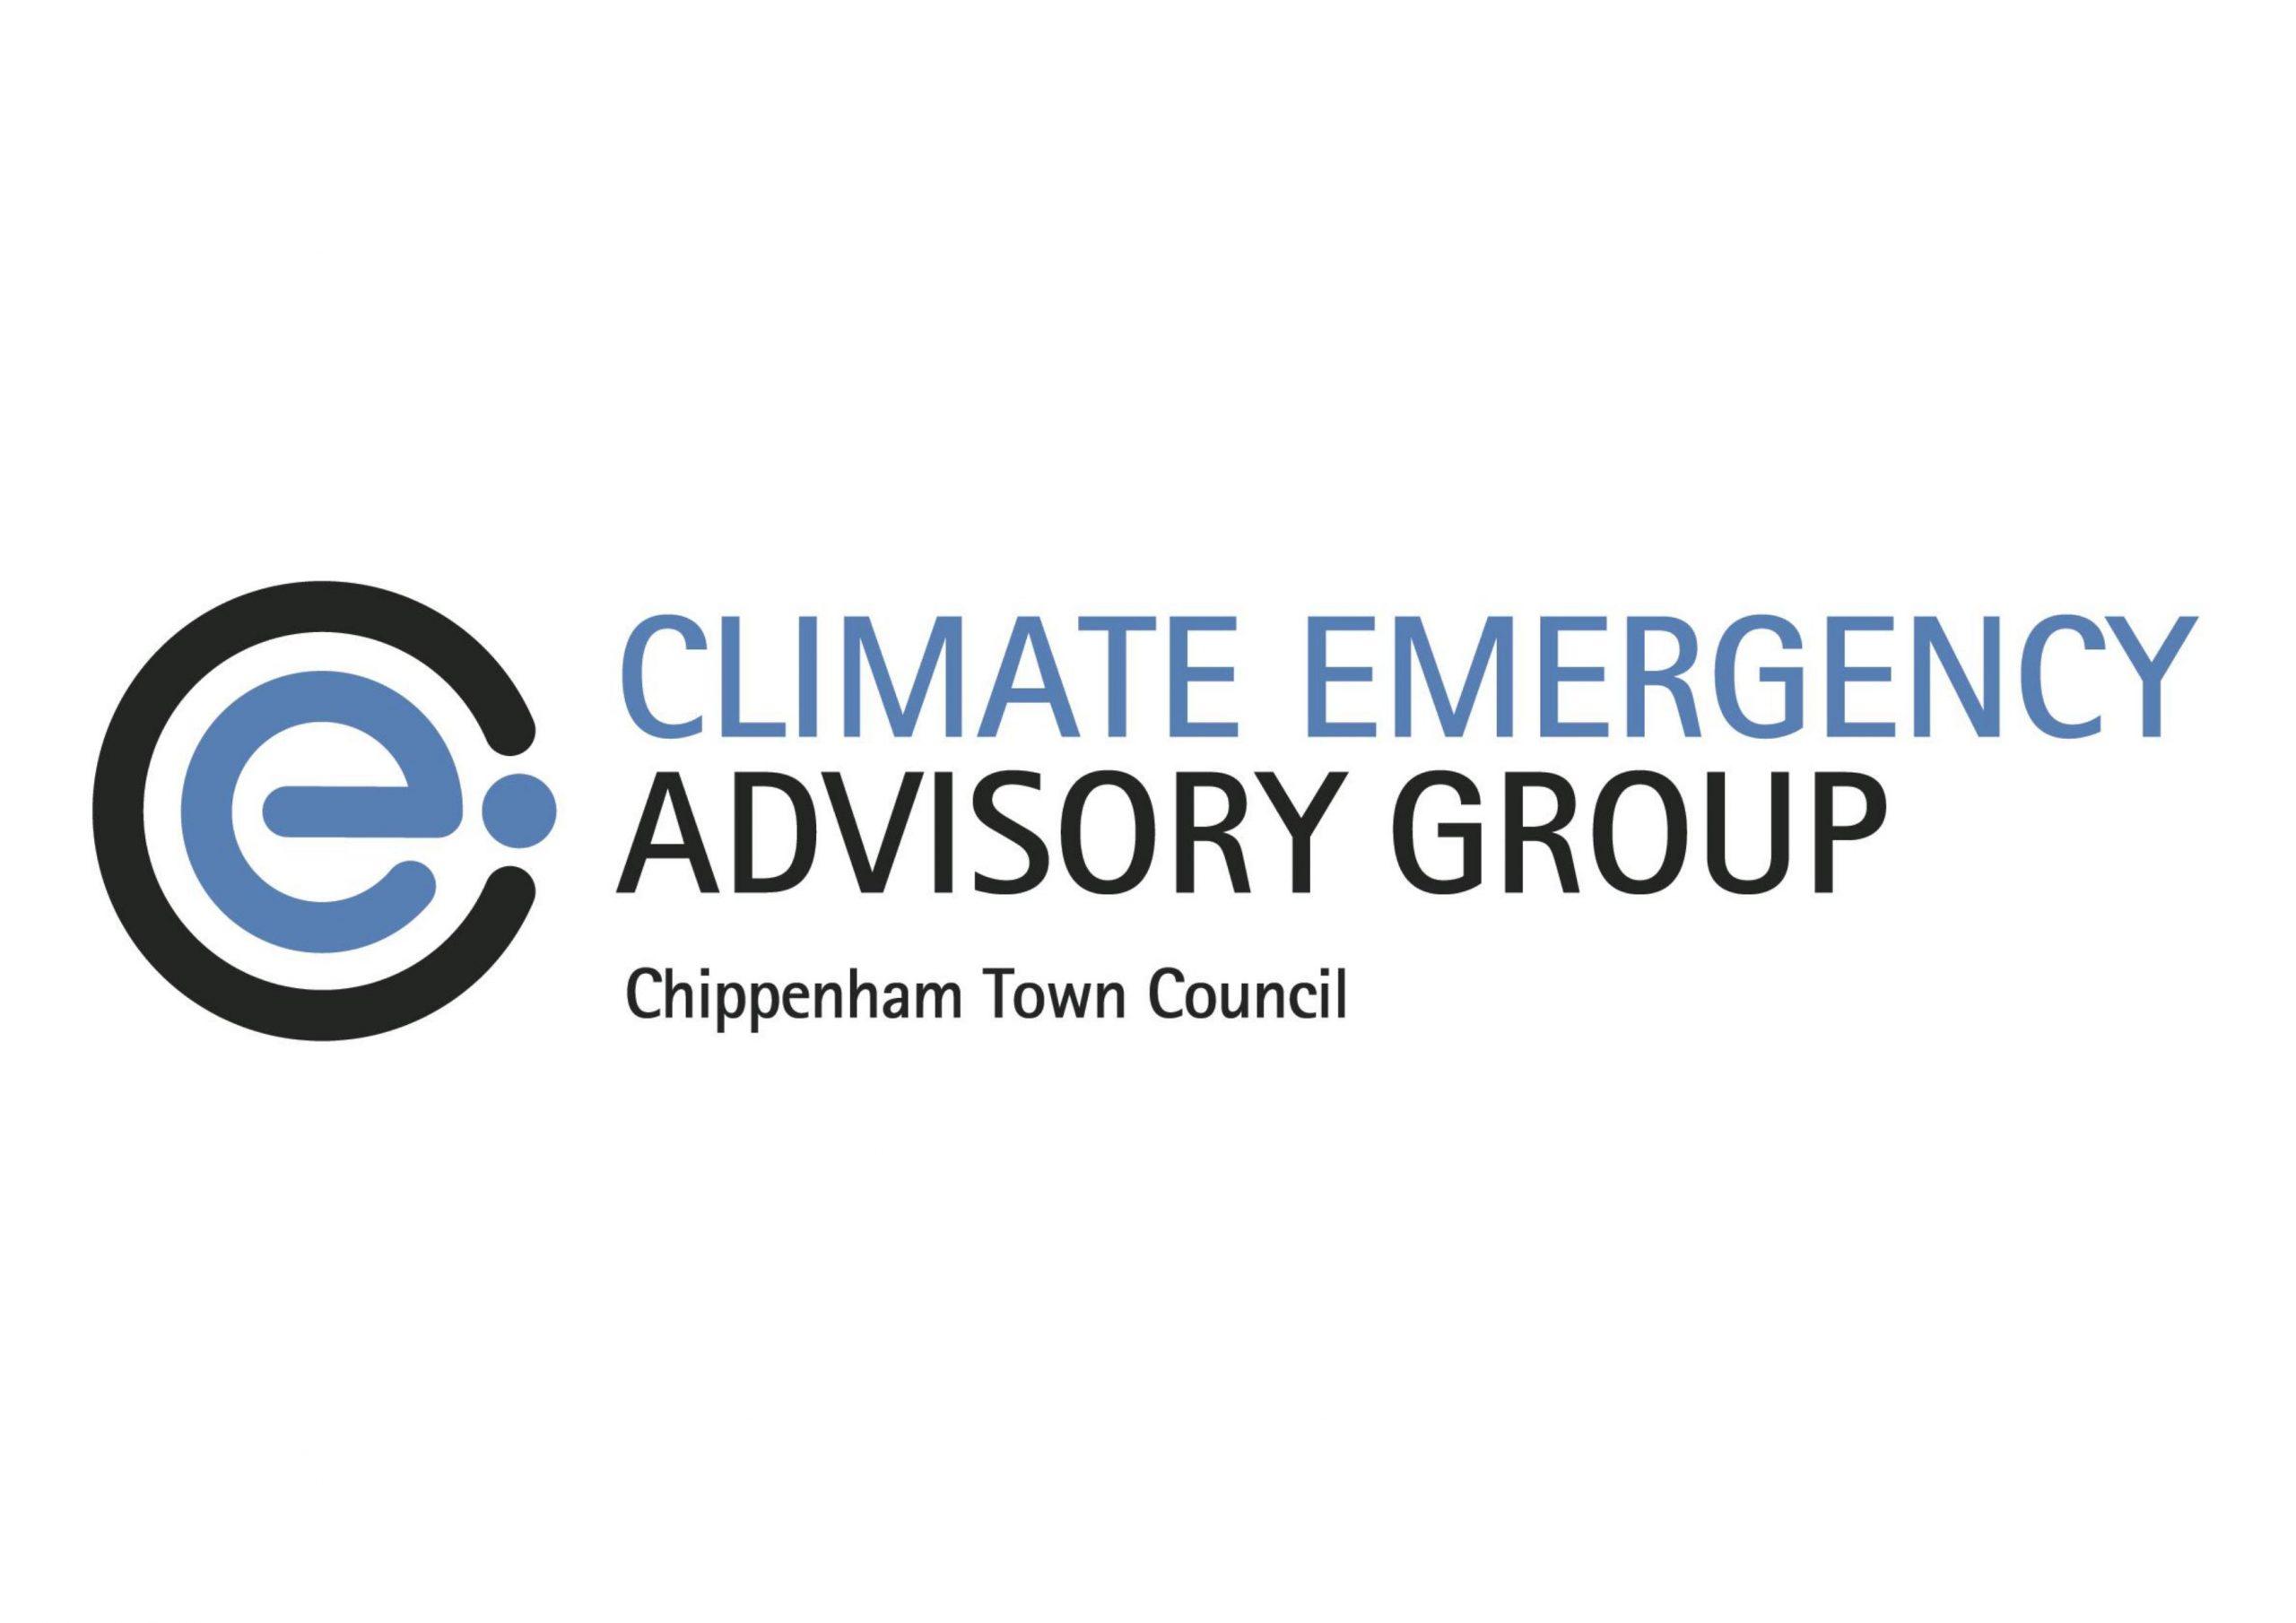 Blue colour 'e' with black around it, blue writing of Climate Emergency, black writing of Advisory Group